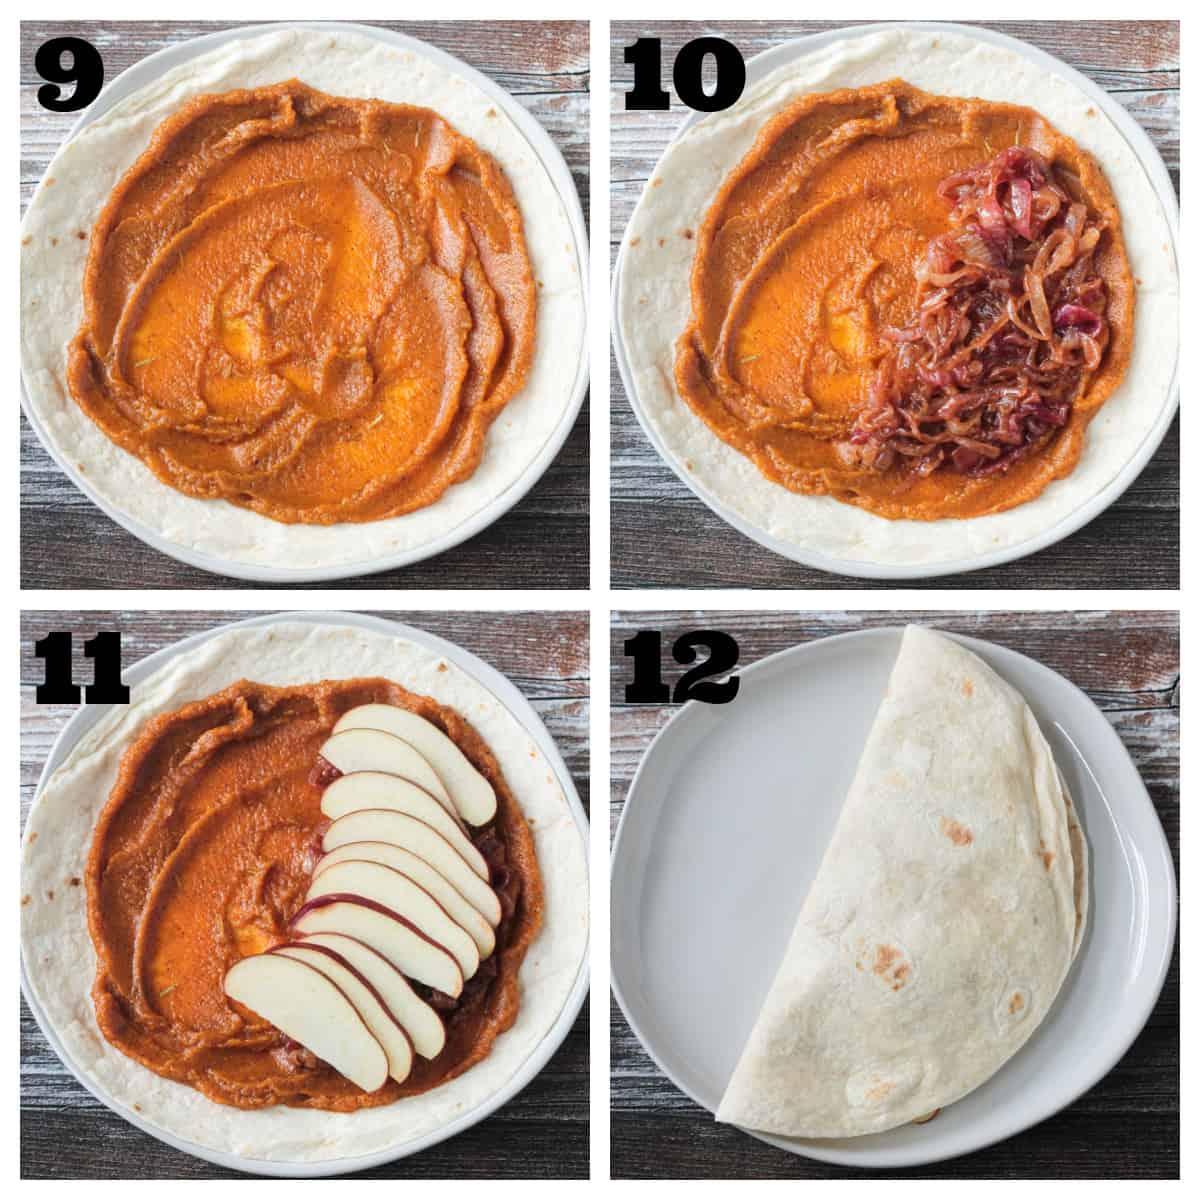 4 photo collage of assembling a pumpkin, apple, onion quesadilla.